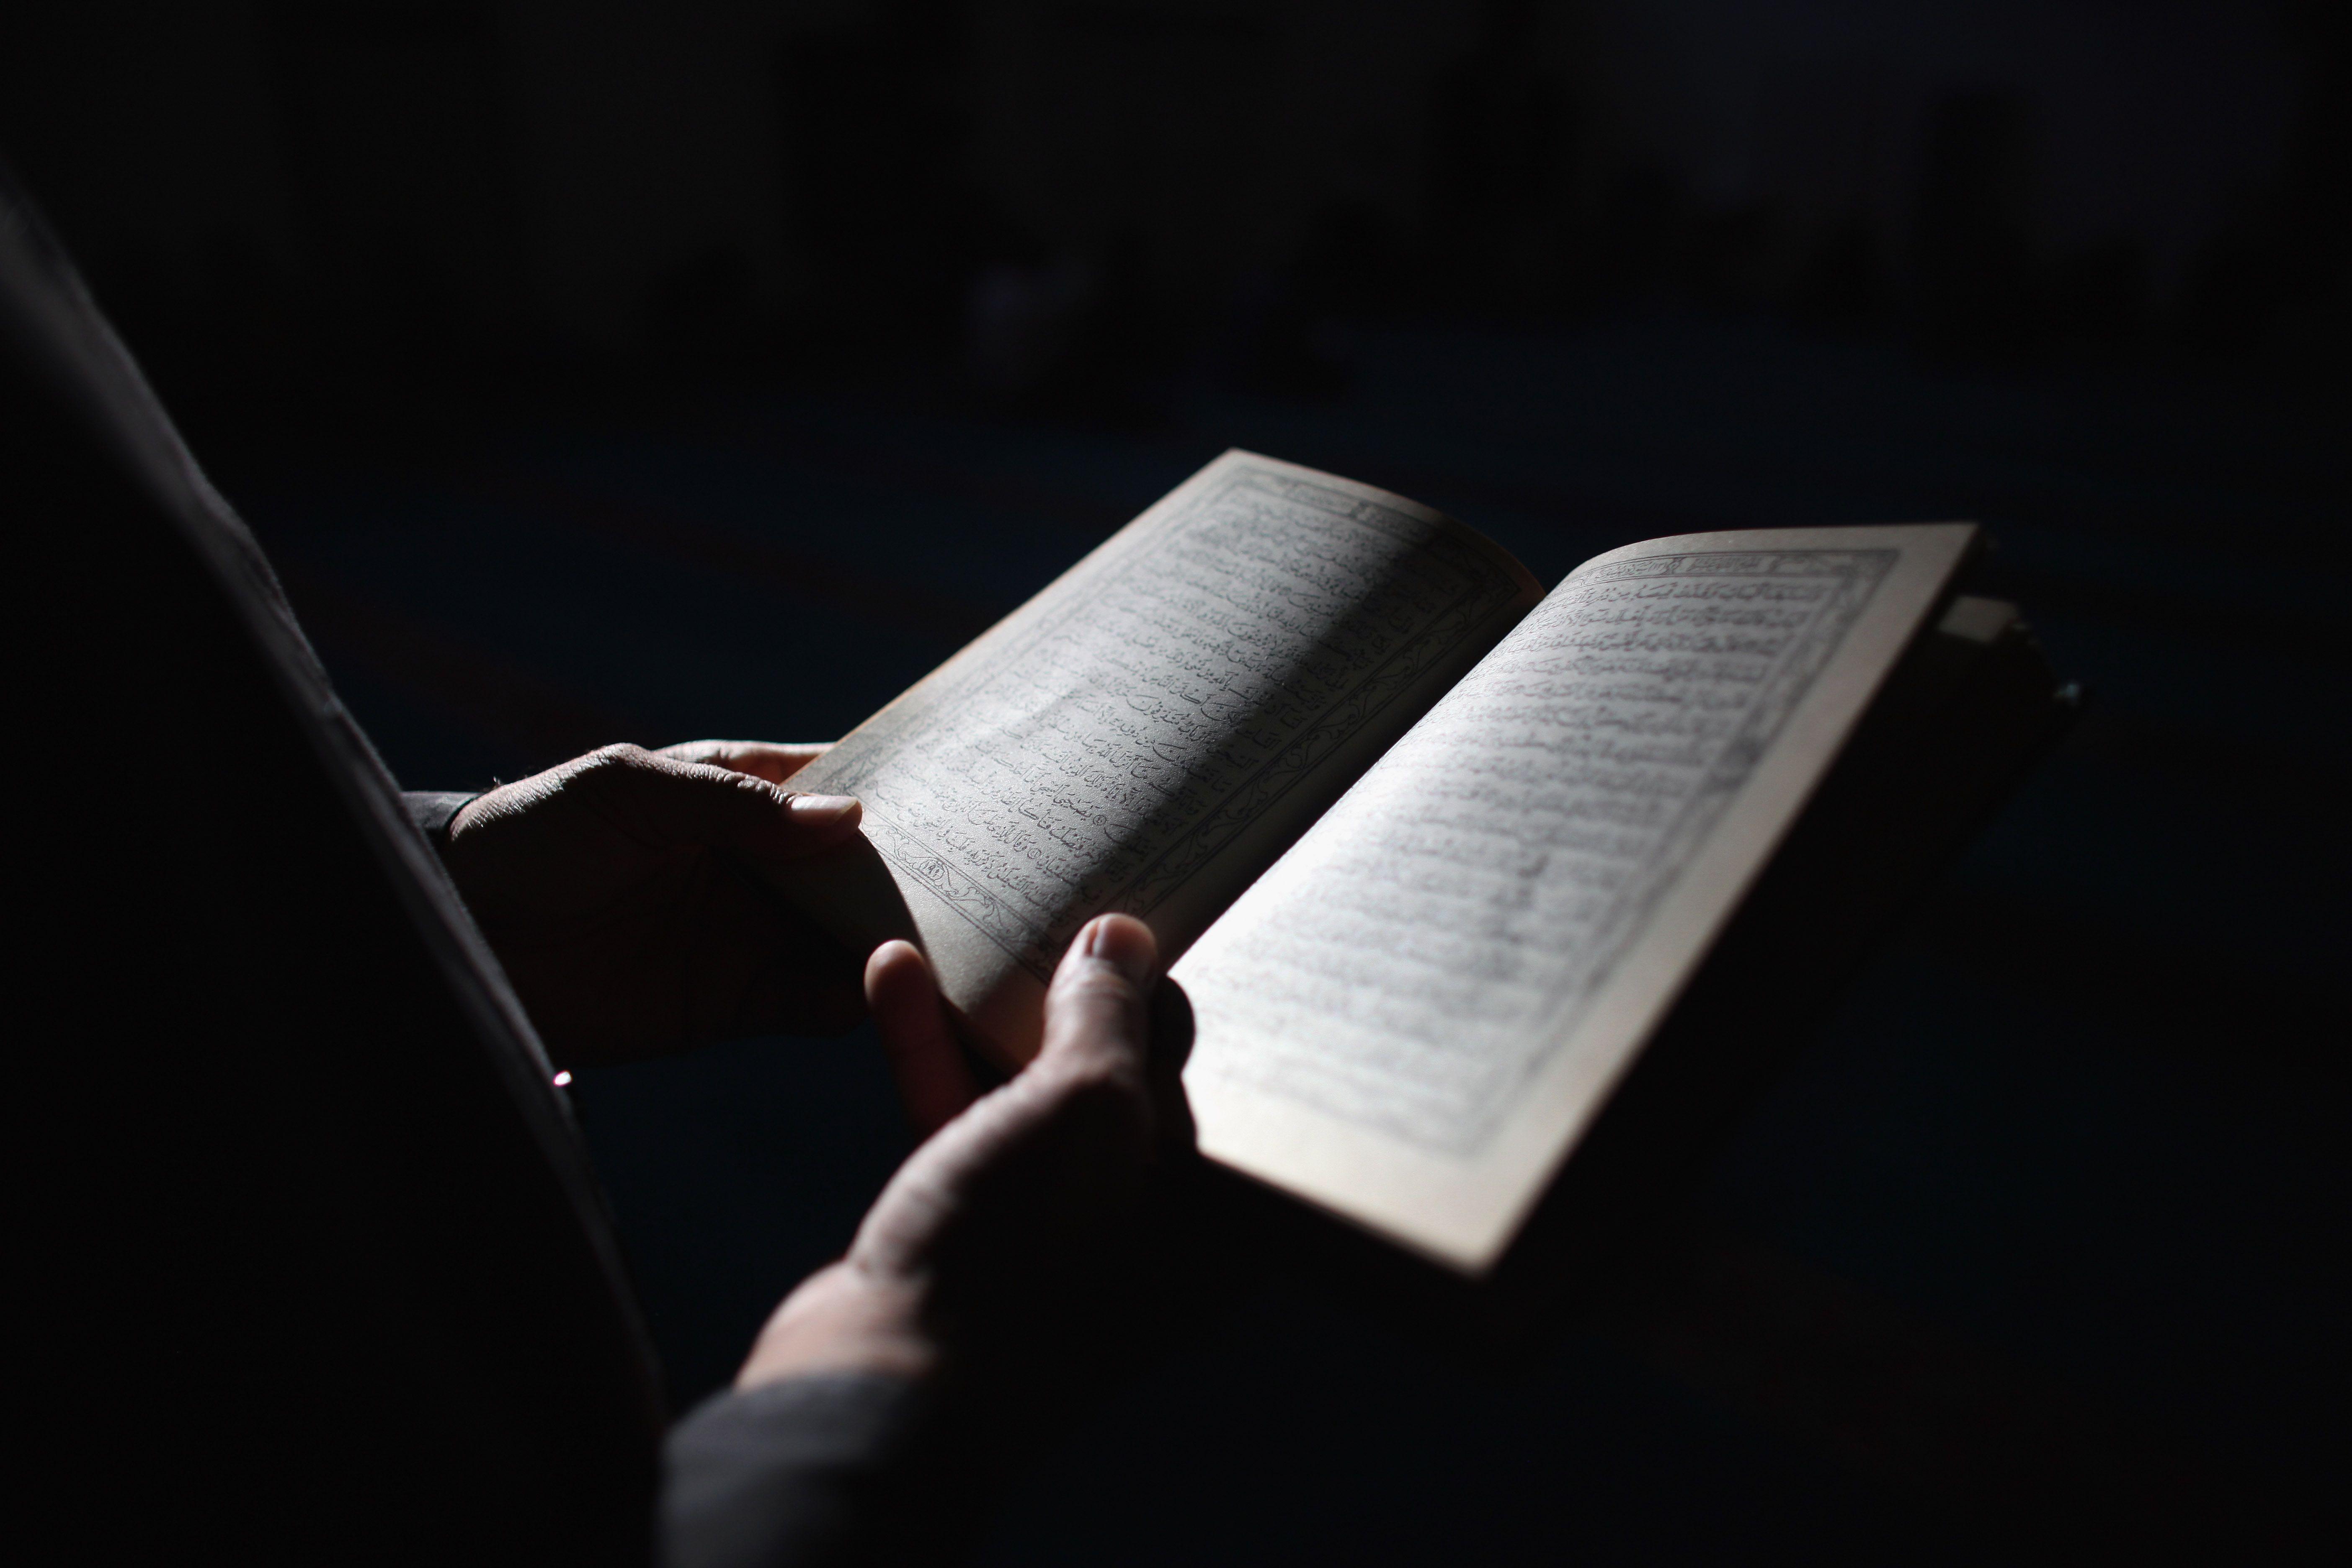 Reading the Quran during Ramadan